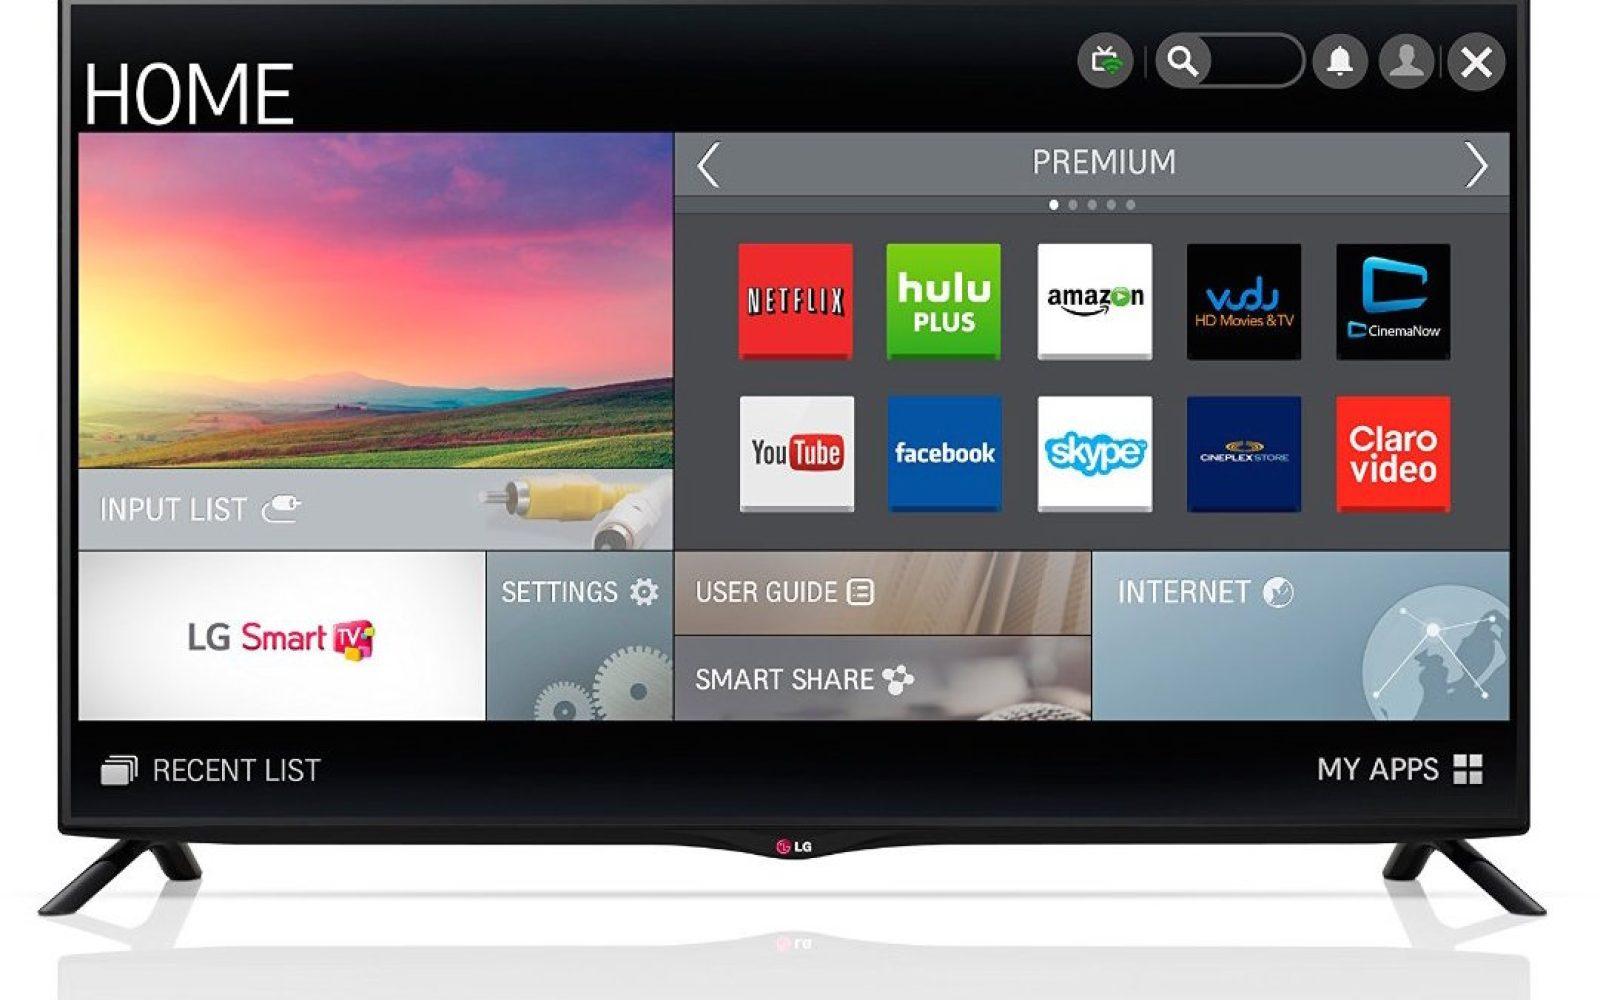 HDTVs: LG 40